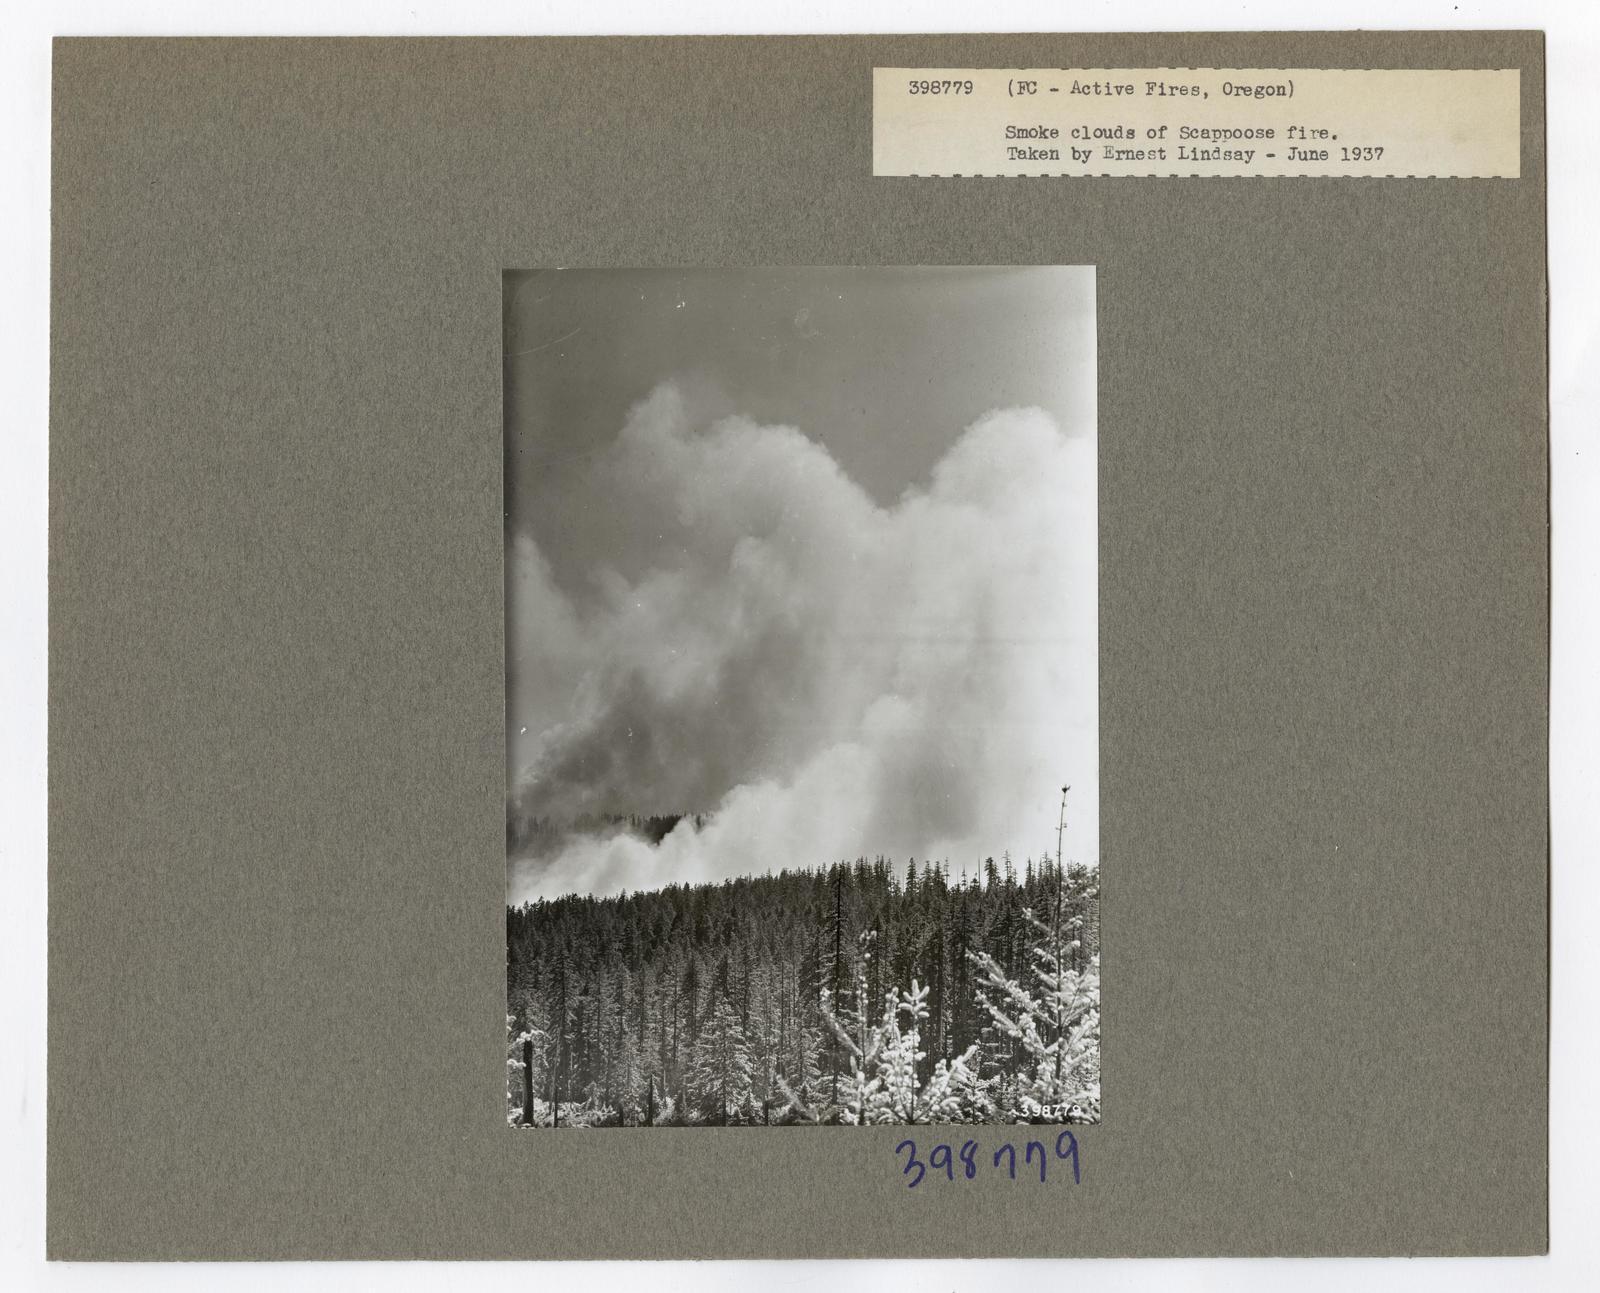 Active Fires - Oregon